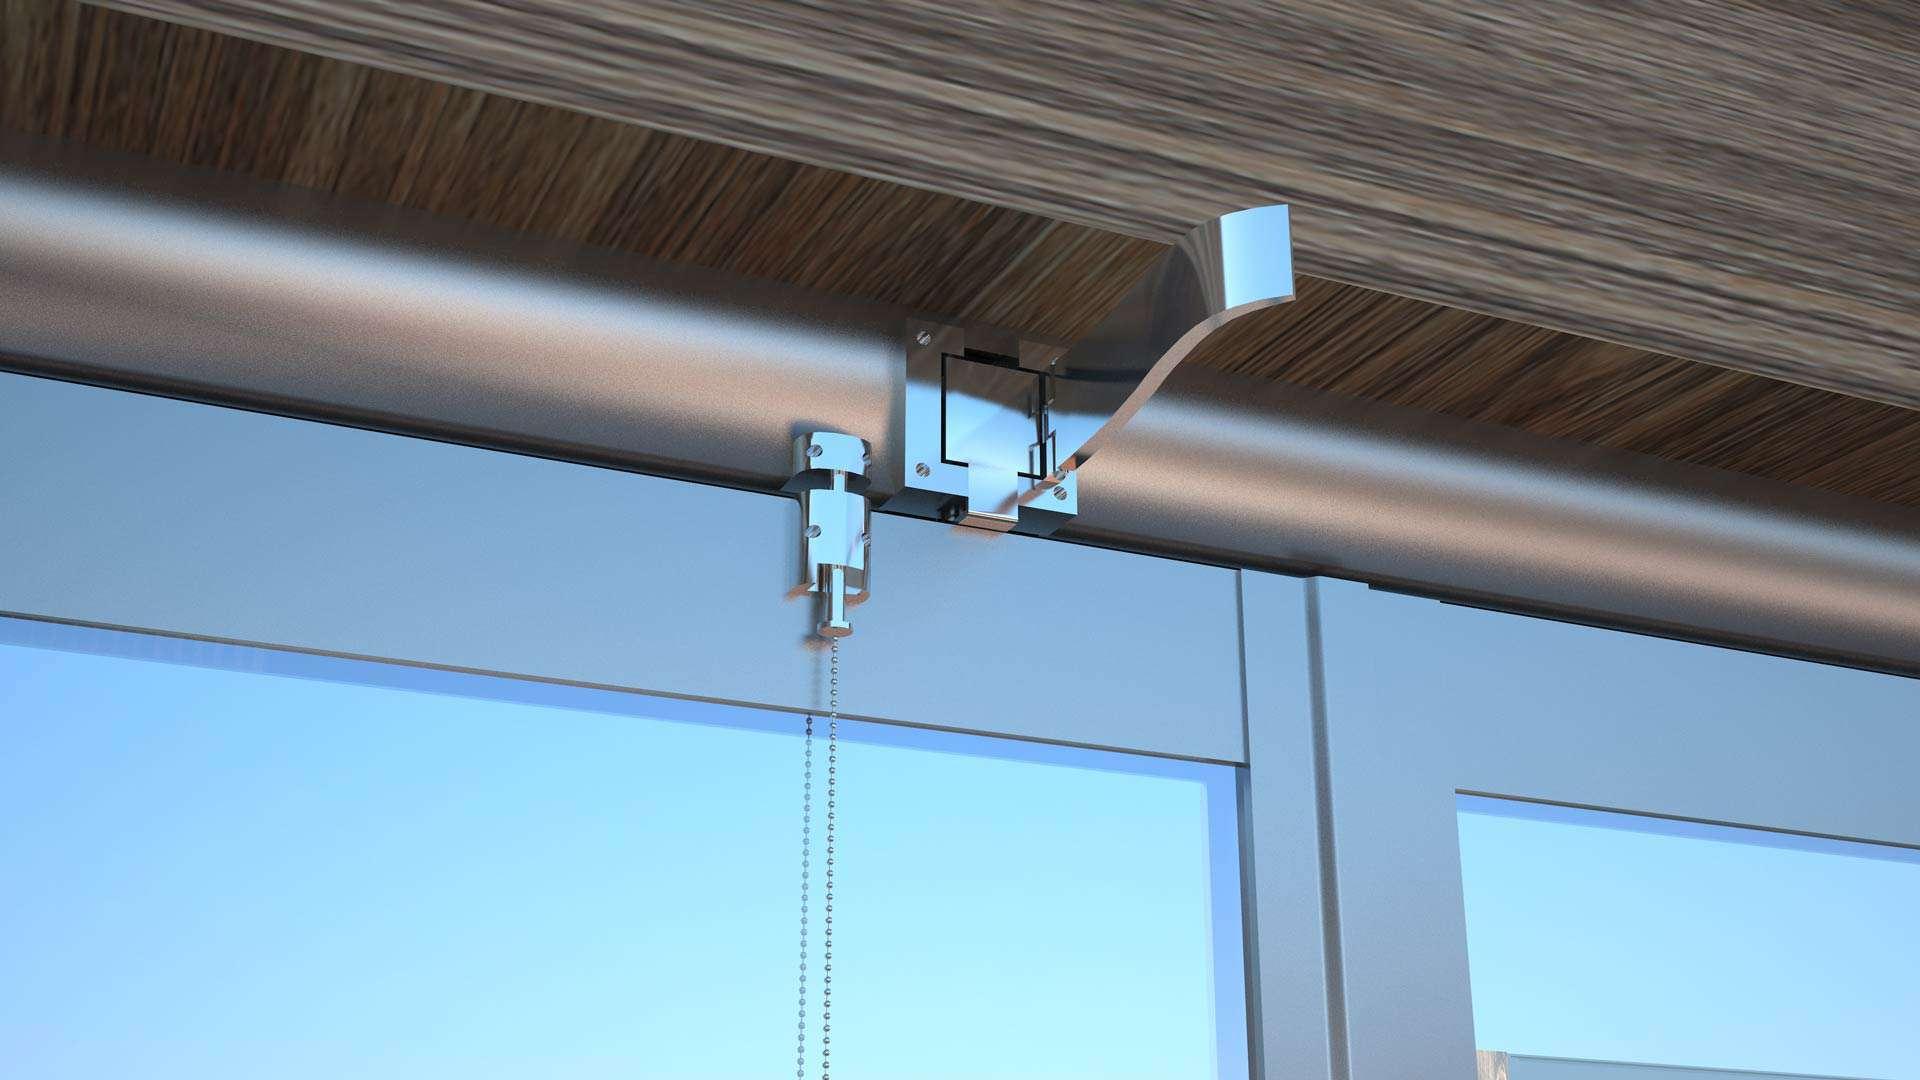 isicamli-katlanir-cam-balkon-sistemi-kilit-detayi